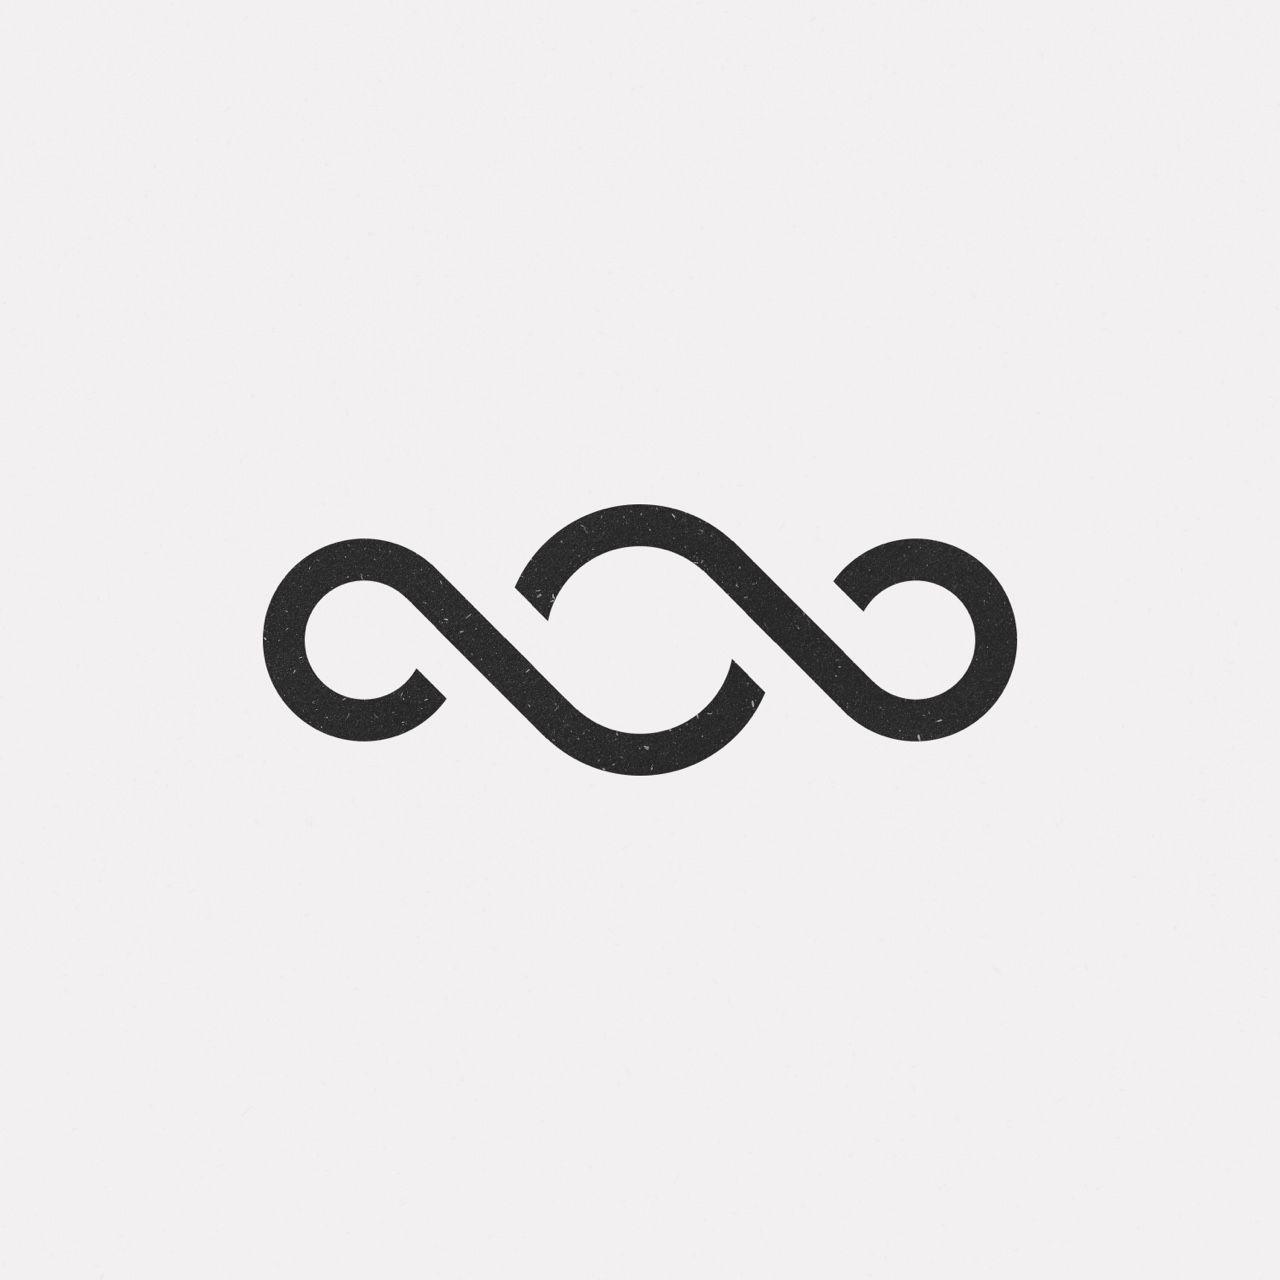 #MA16-516   A new geometric design every day